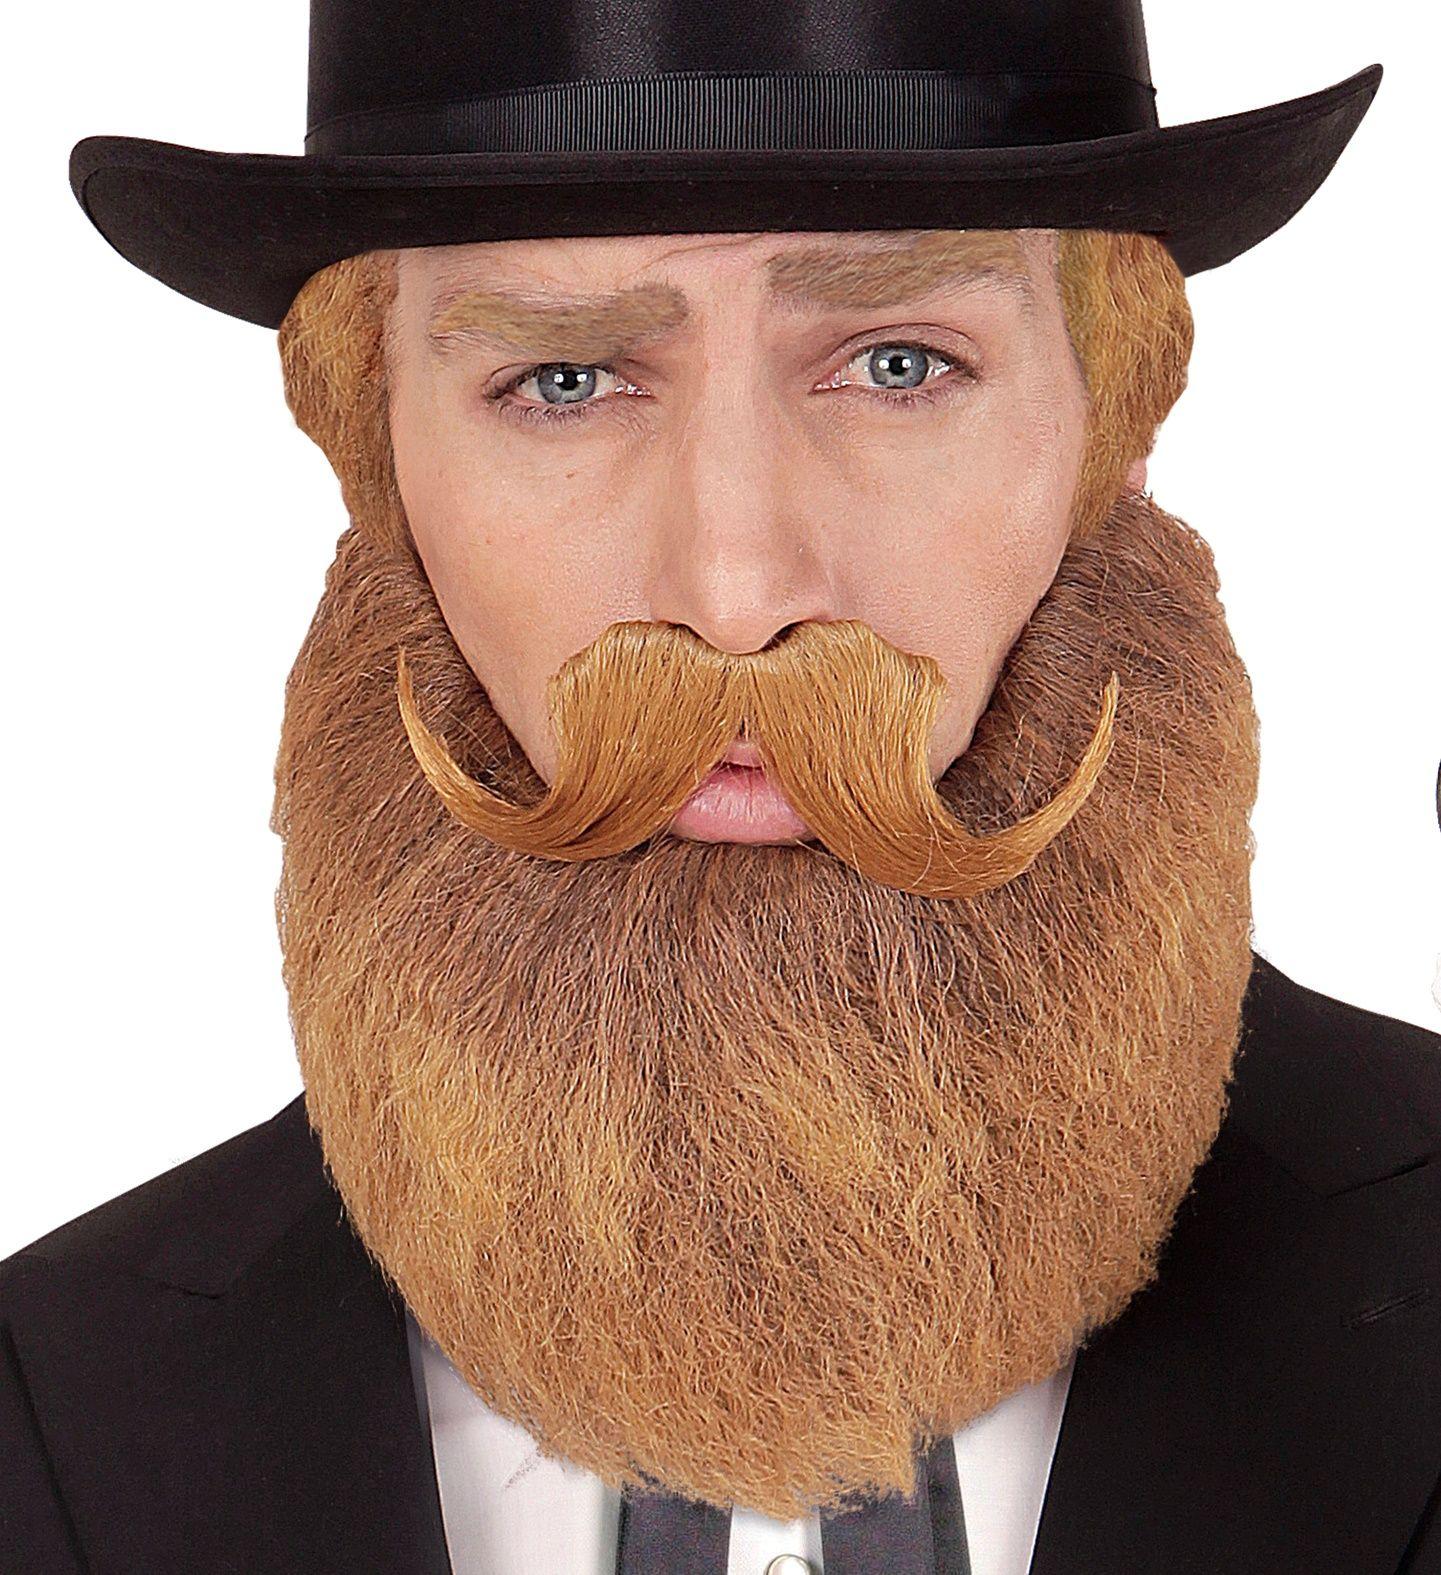 Oranje baard en snor